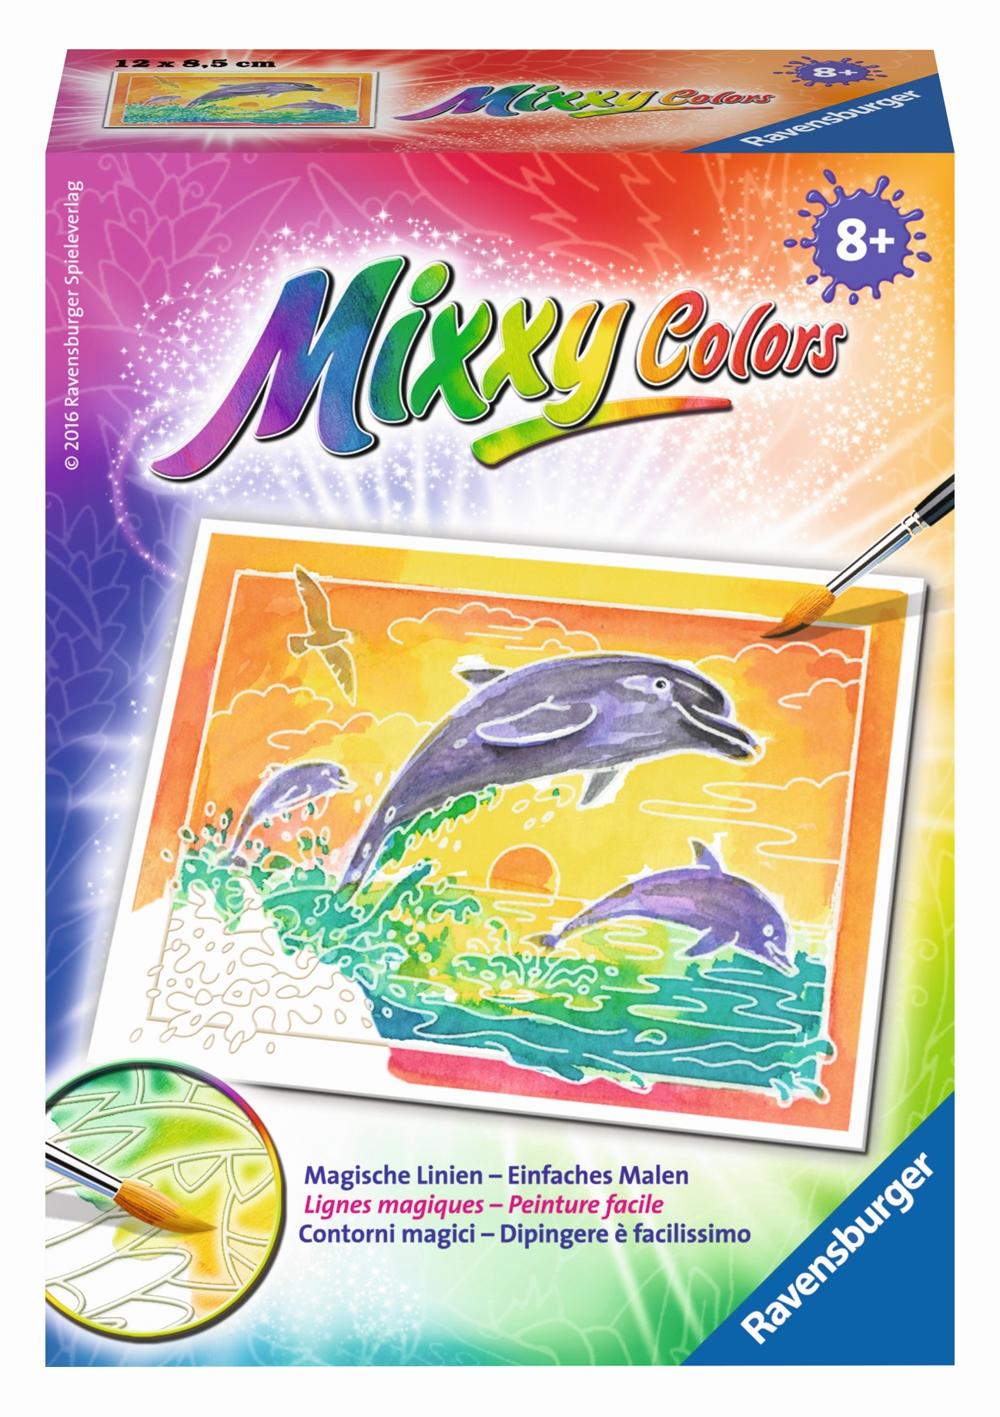 Mixxy Colors Spielende Delfine